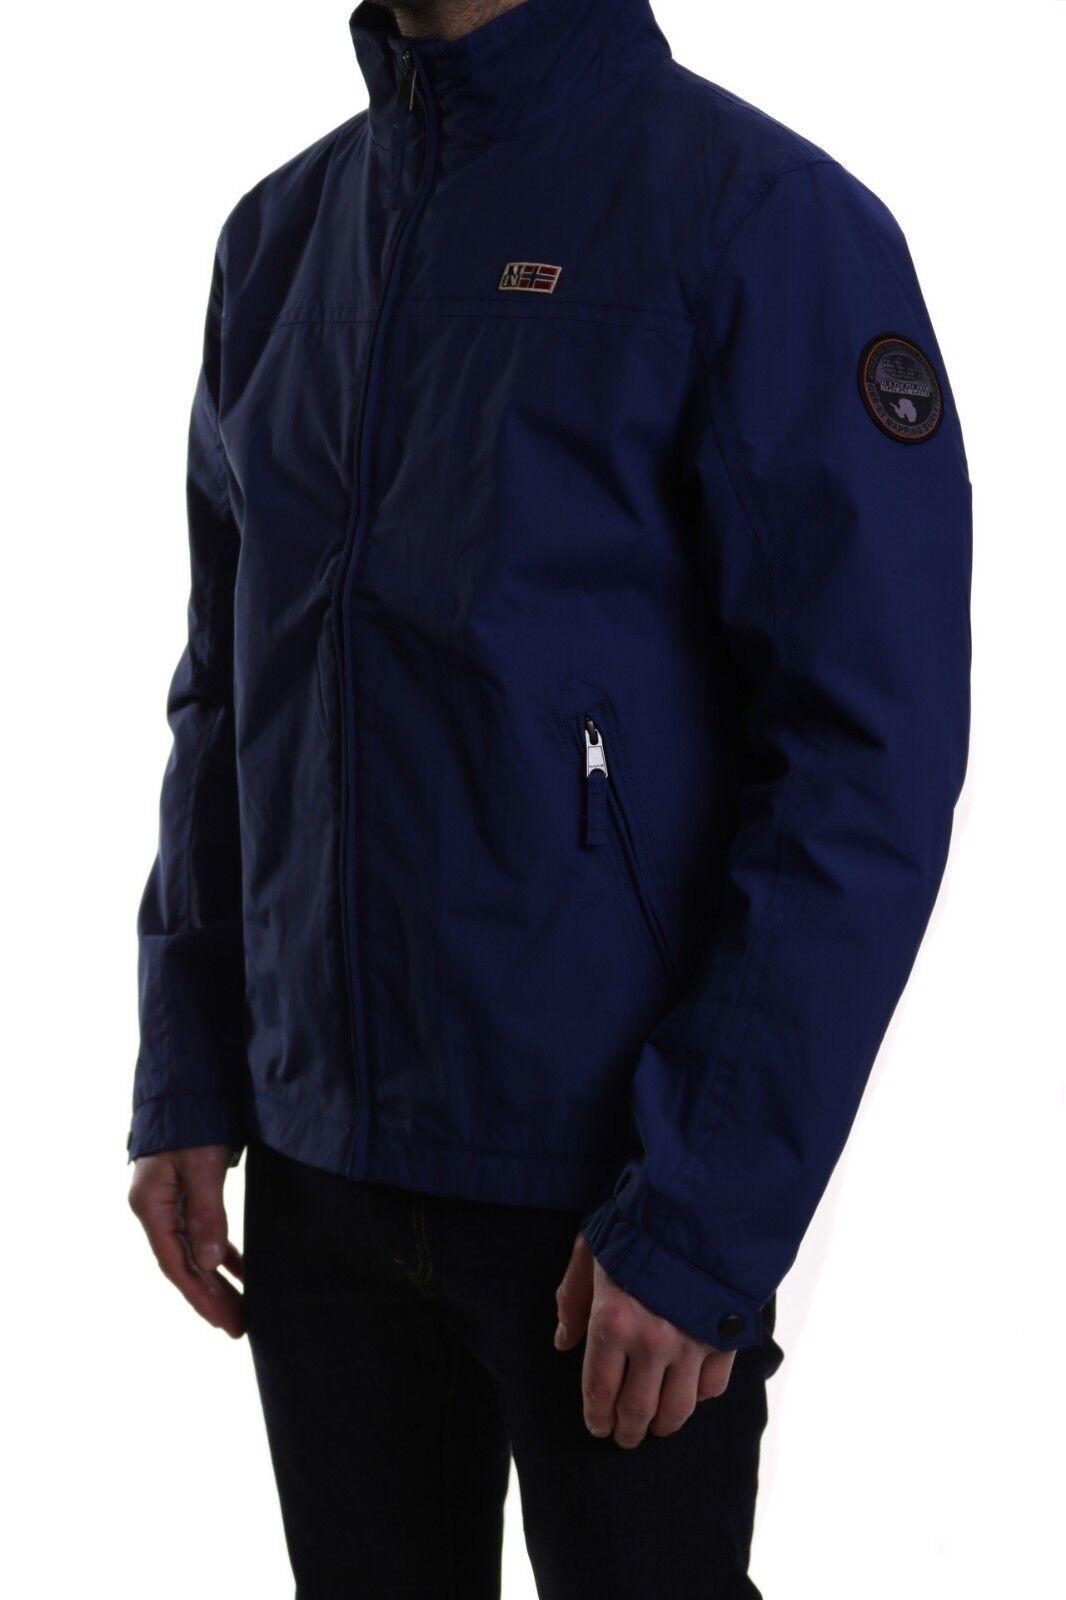 Napapijri Shelter Shower Rain Windbreaker Jacket Blau Depths 30% Off